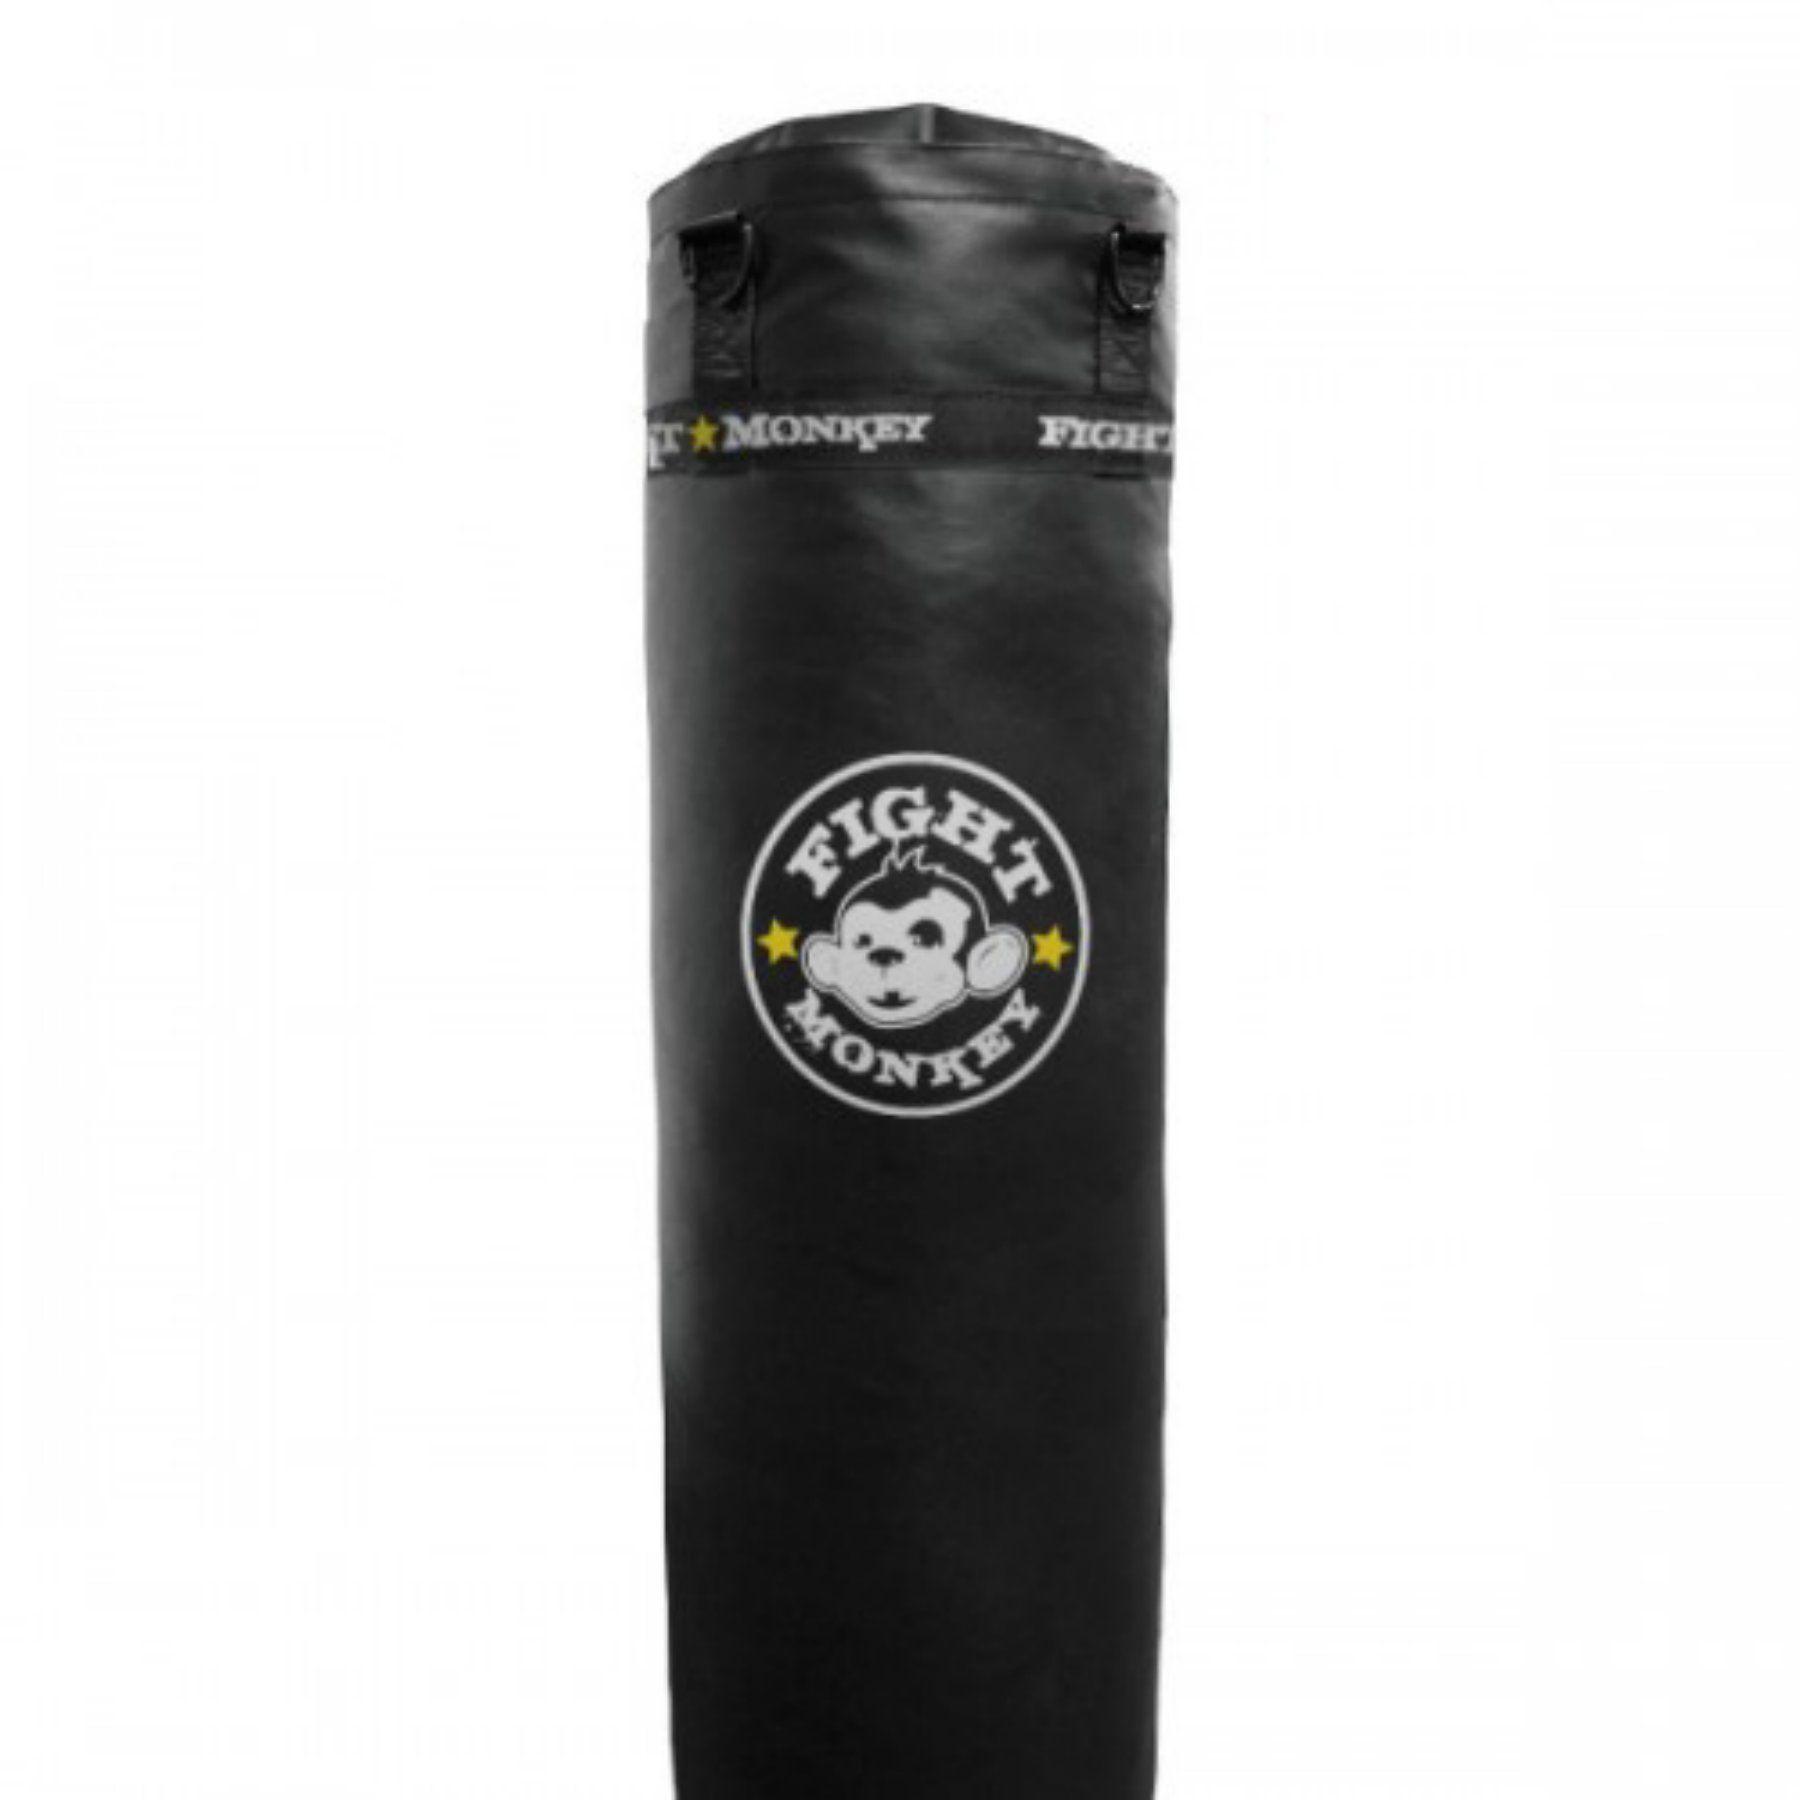 Fight monkey muay thai mma 125 lb heavy bag fm502